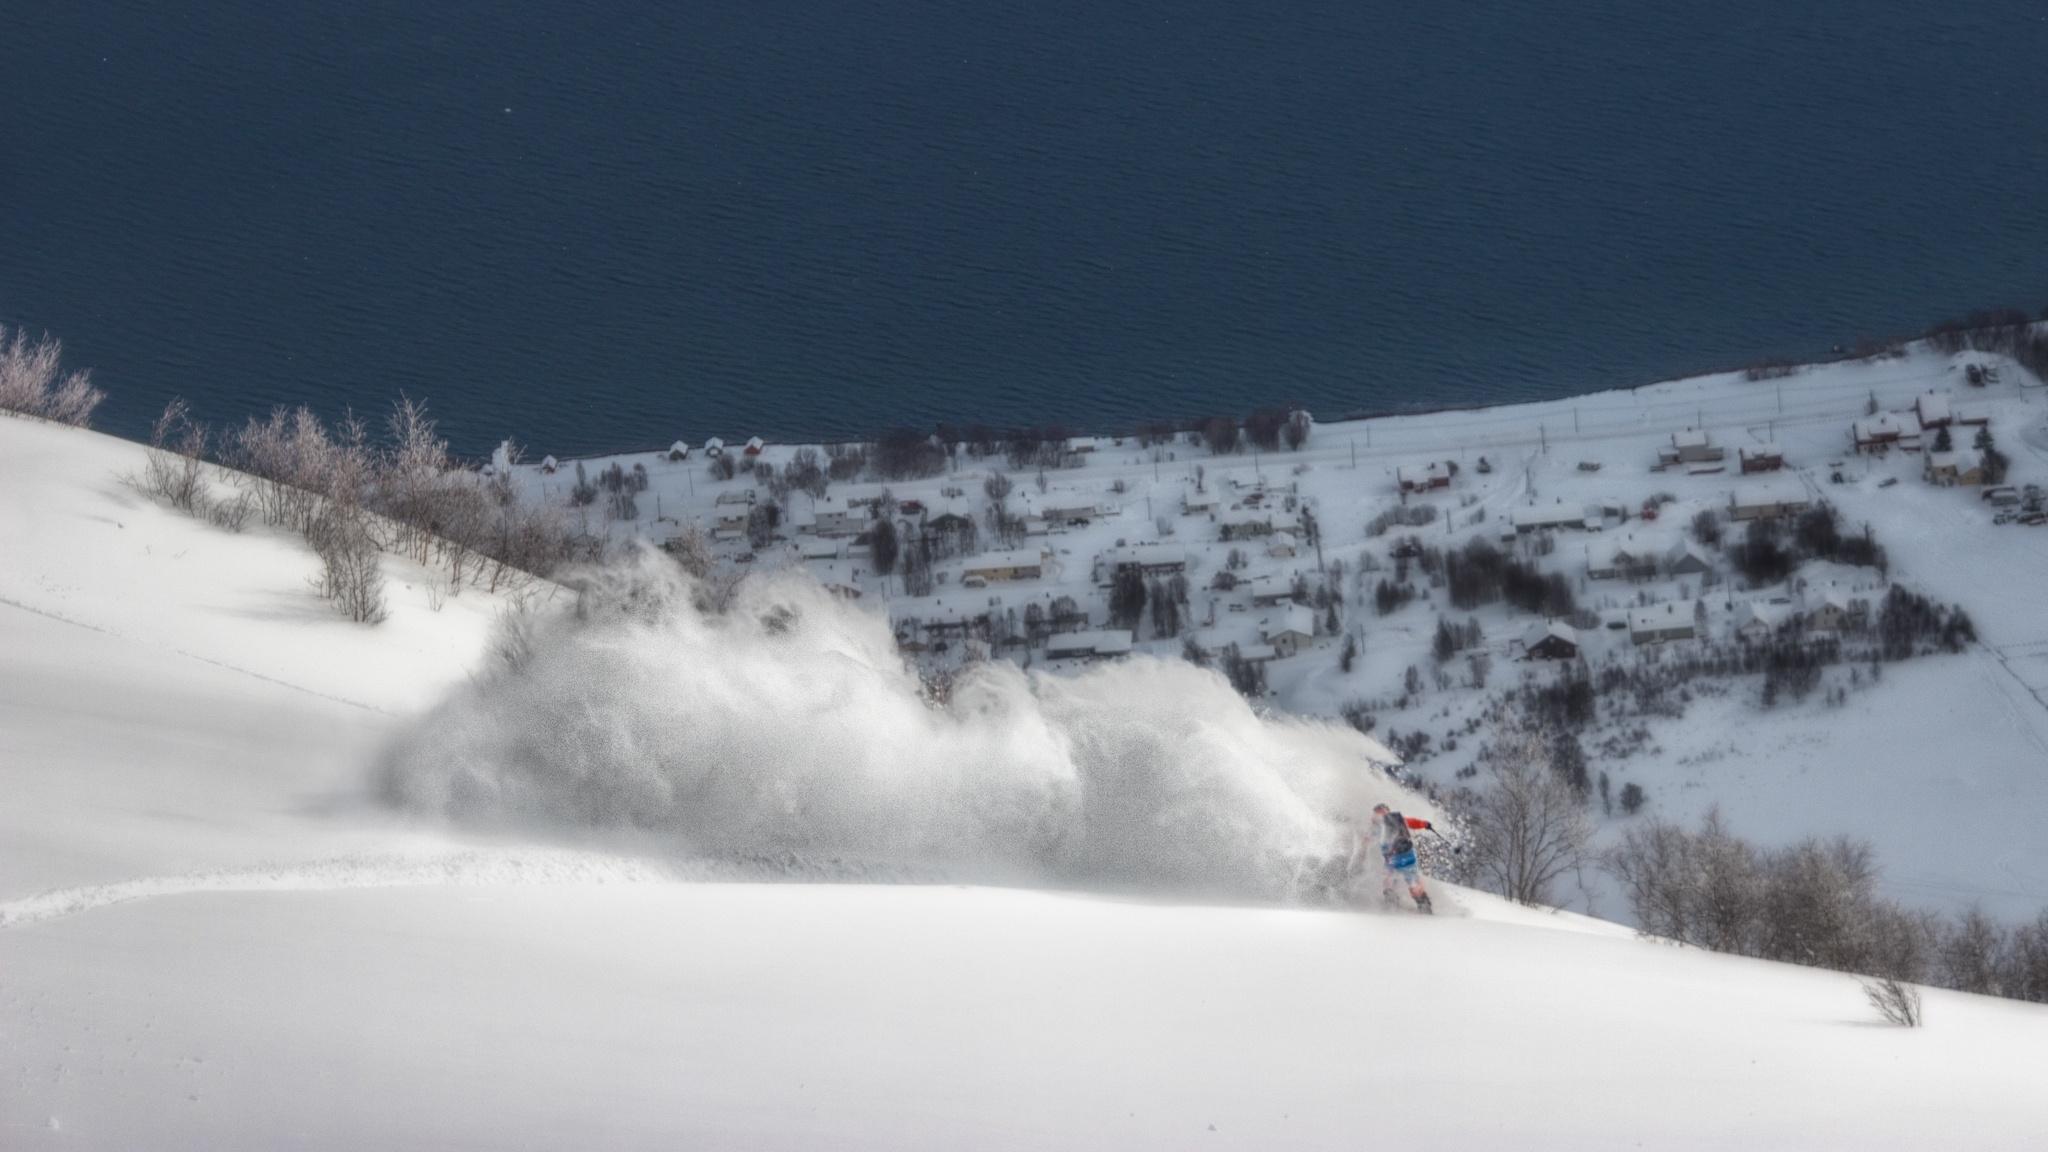 Lyngen Alps, Ekaitz Isasi - Ski & Snowboard - Fotos del Valle del Aragón, Mikel Besga